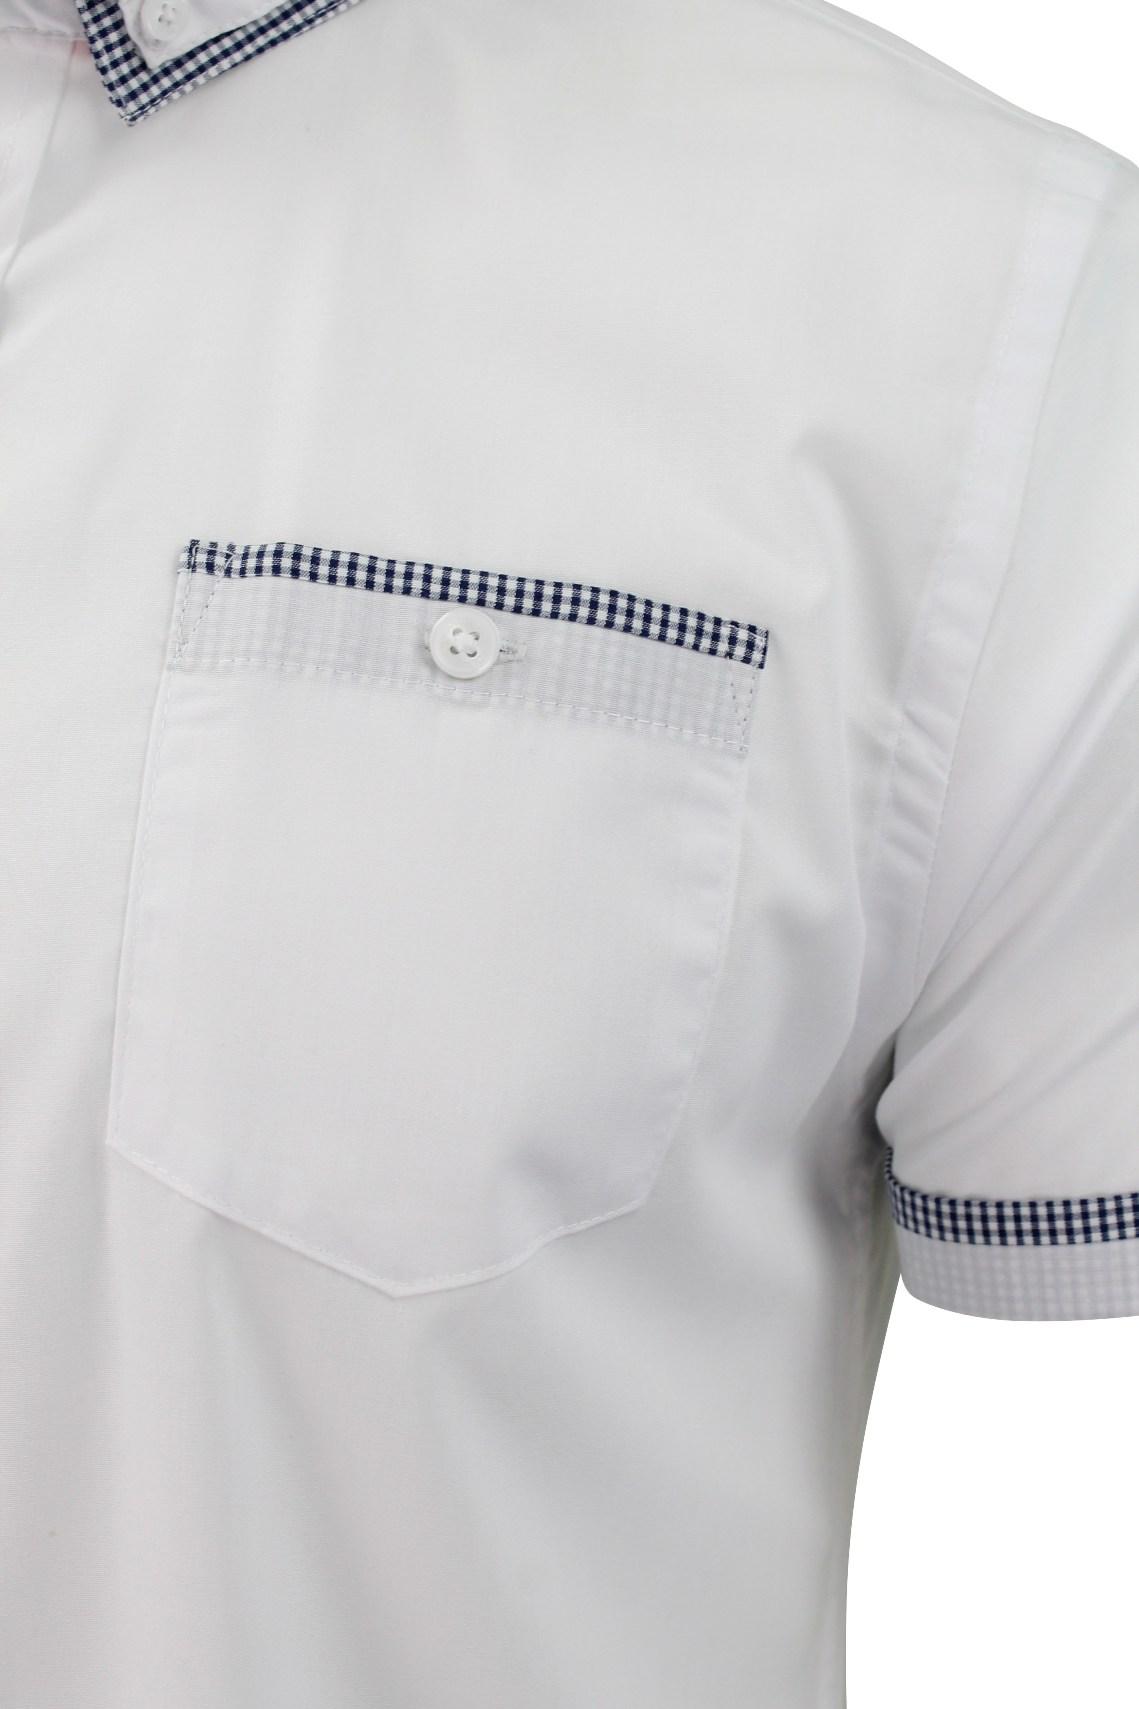 Mens-Shirt-by-Brave-Soul-039-Colvin-039-Gingham-Trim-Short-Sleeved thumbnail 9